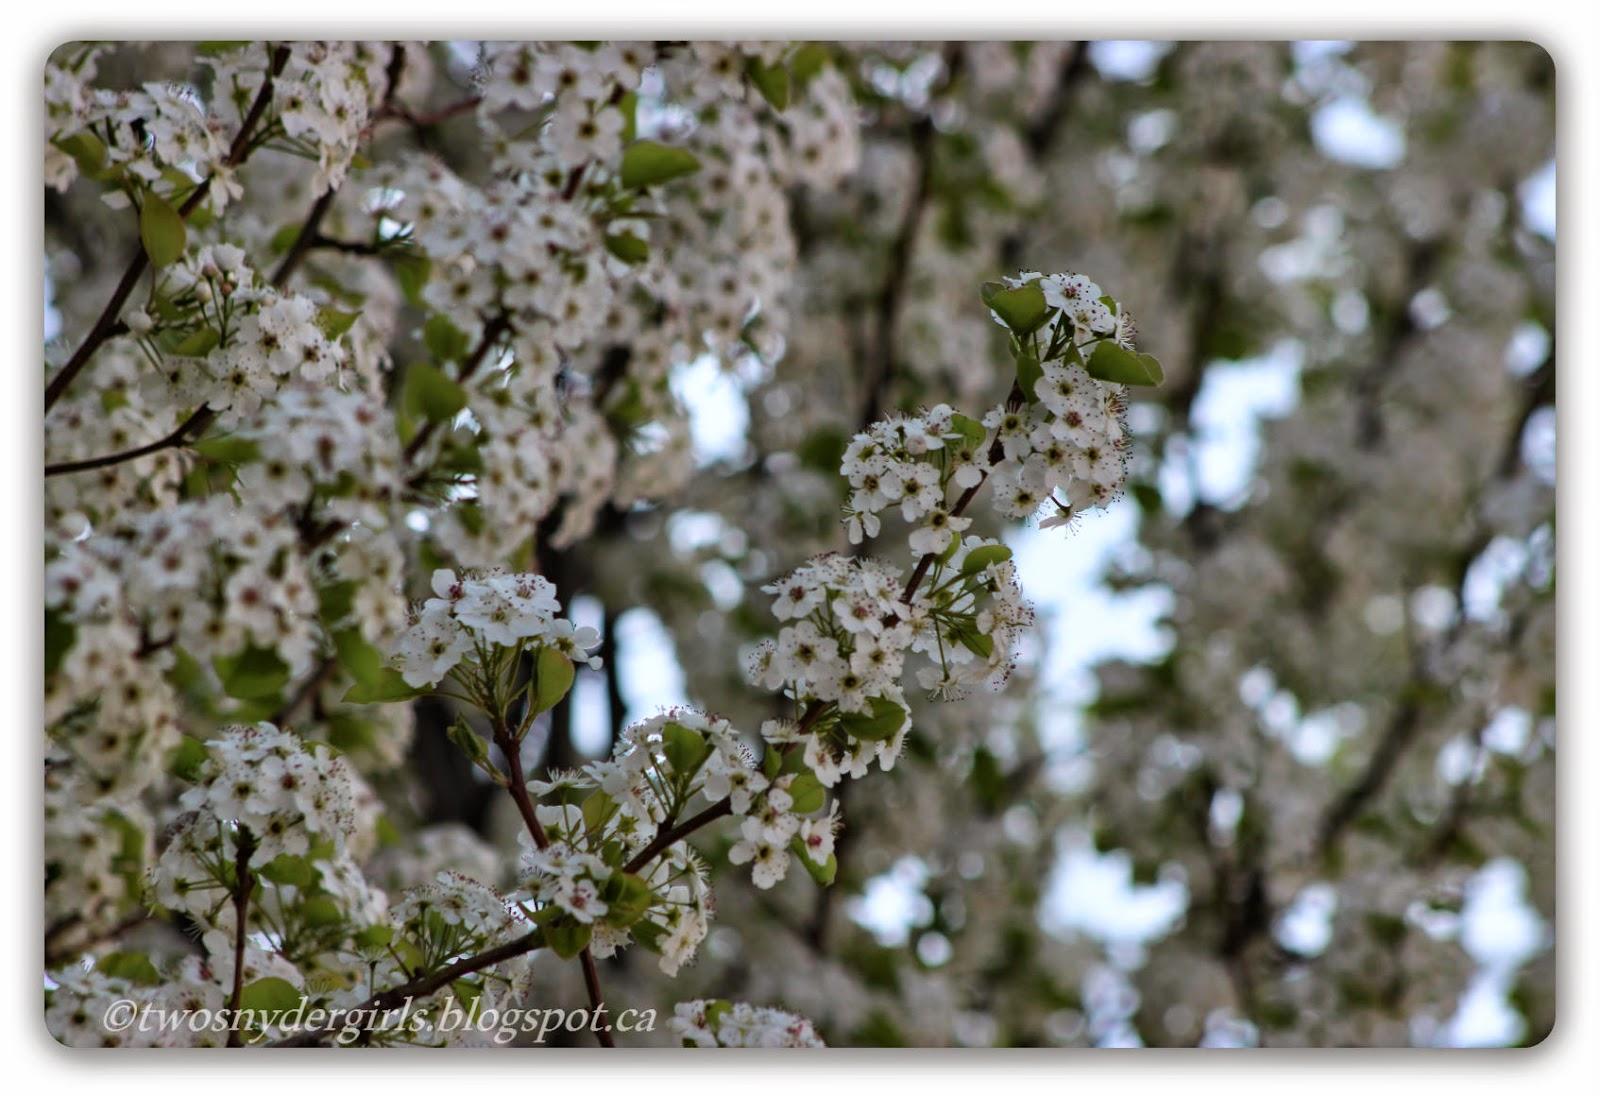 Spring blossoms white